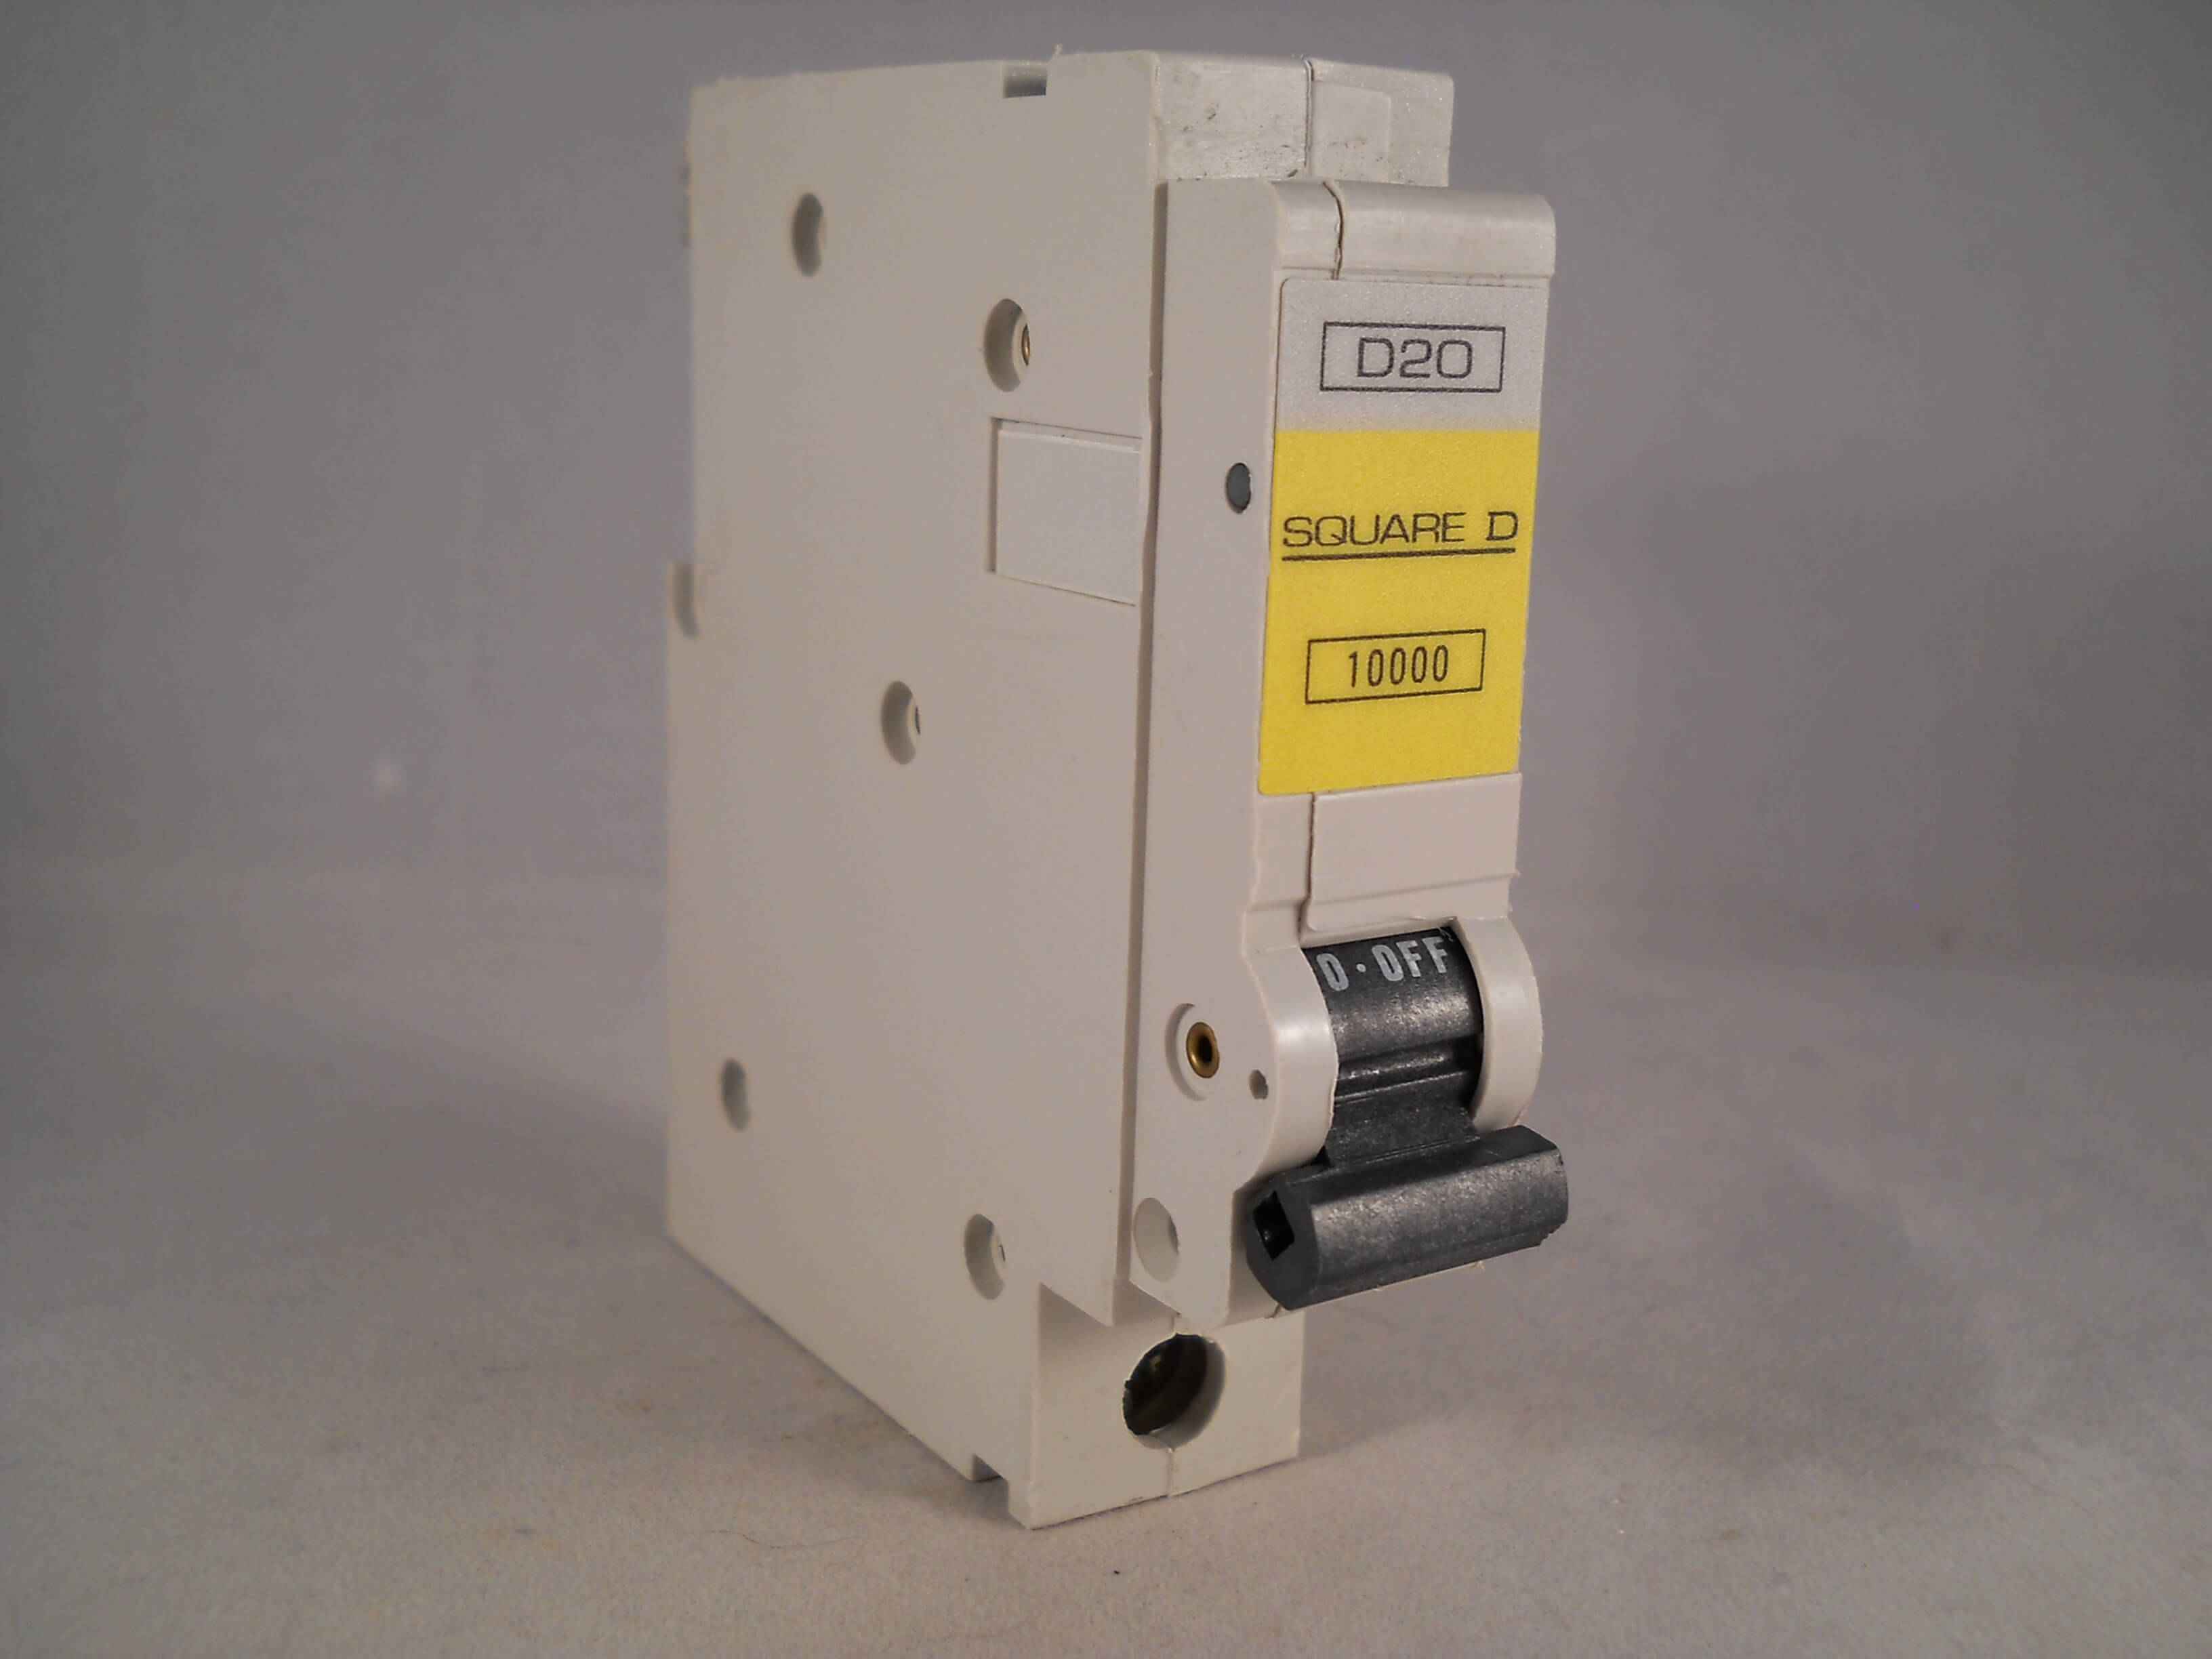 Single Pole Circuit Fuse Box Schematic Diagrams 20 Amp Breaker Fuses House Amps 10000 Wiring Diagram Symbols U2022 2001 Kia Sephia